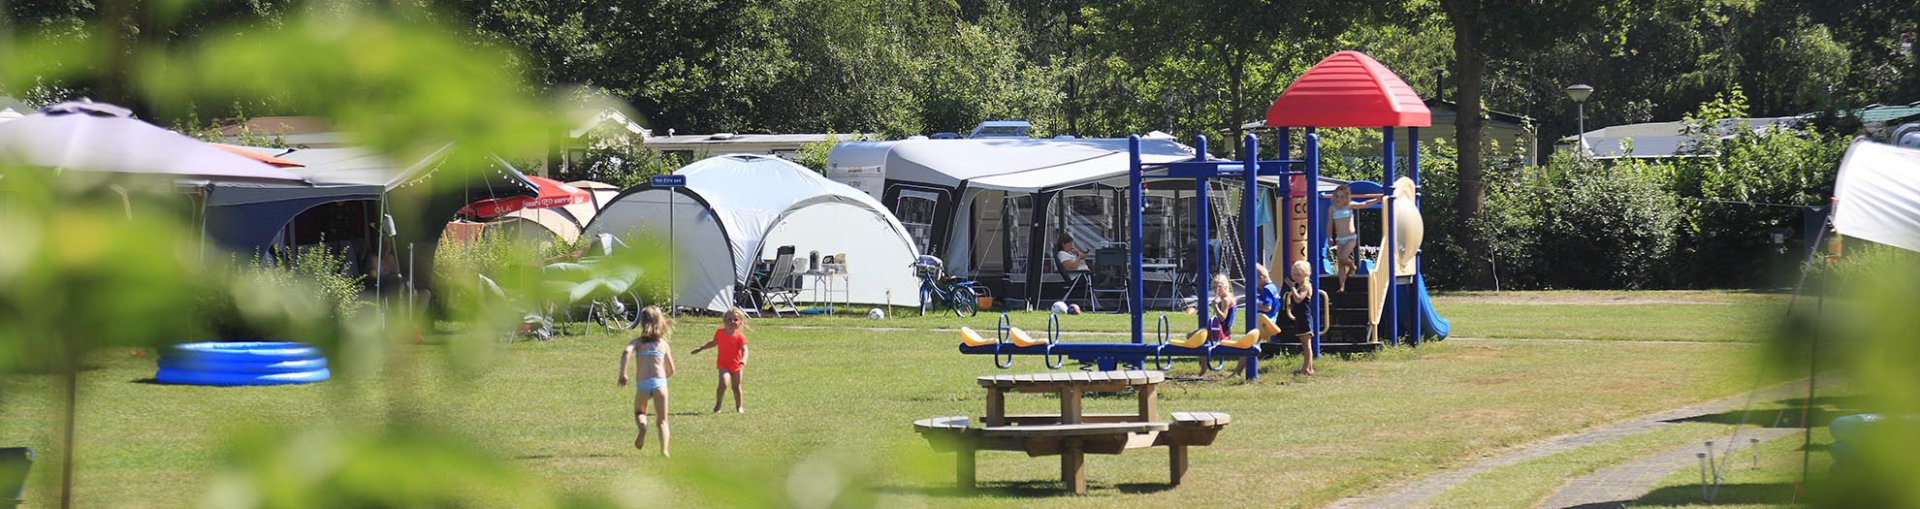 kamperen Camping Heino